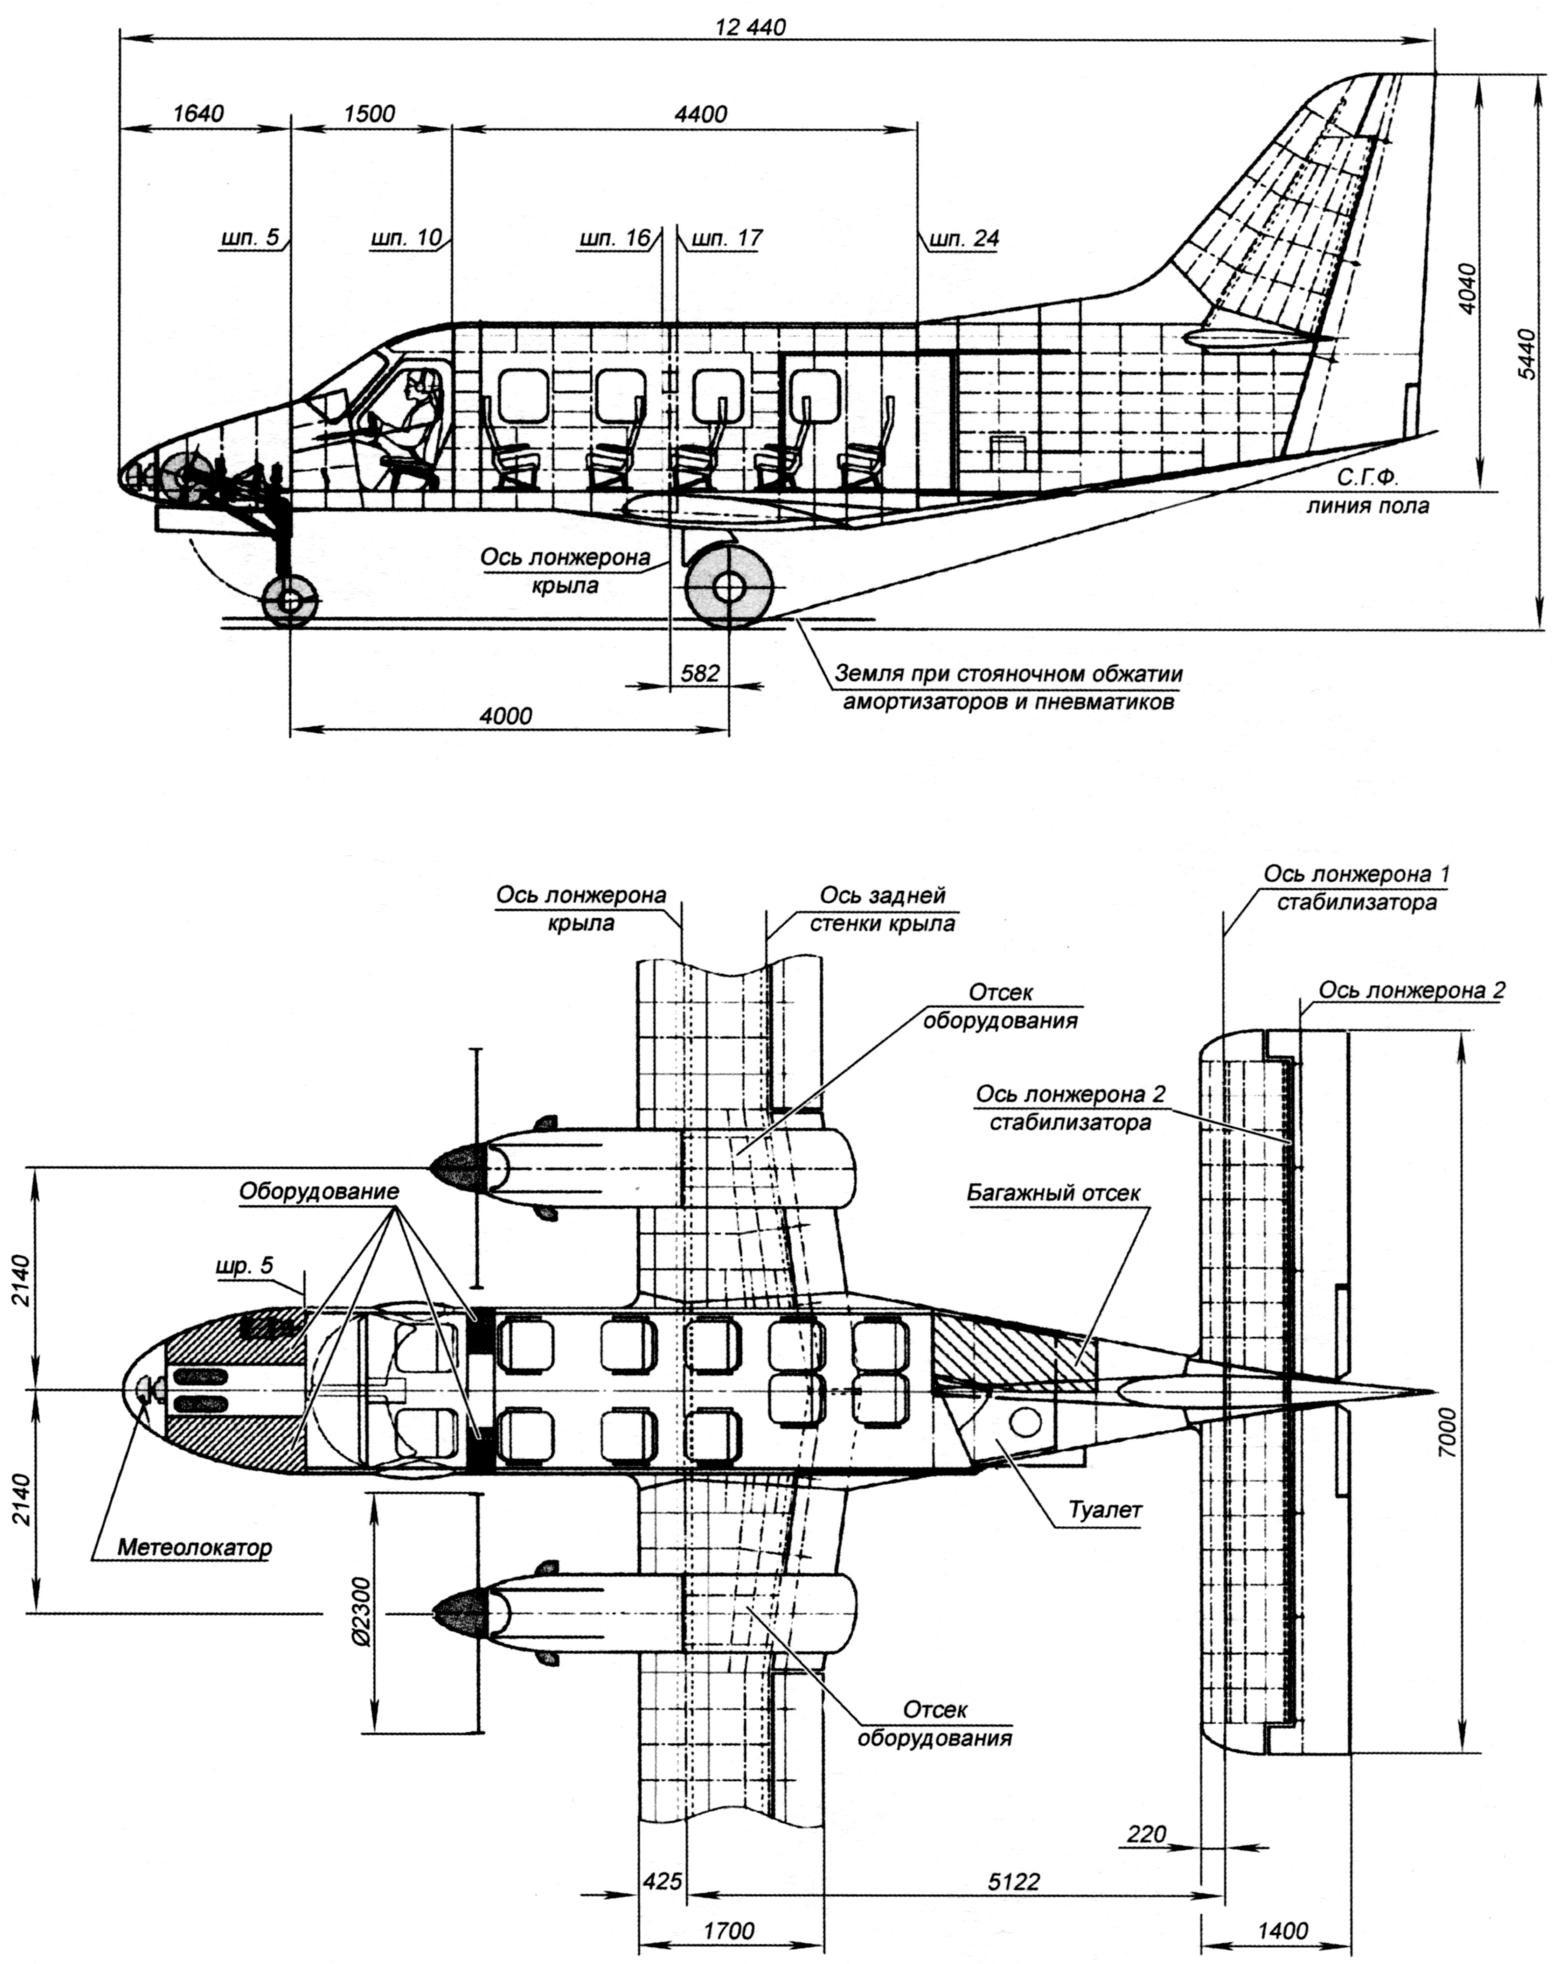 Компановка самолёта «Рысачок»